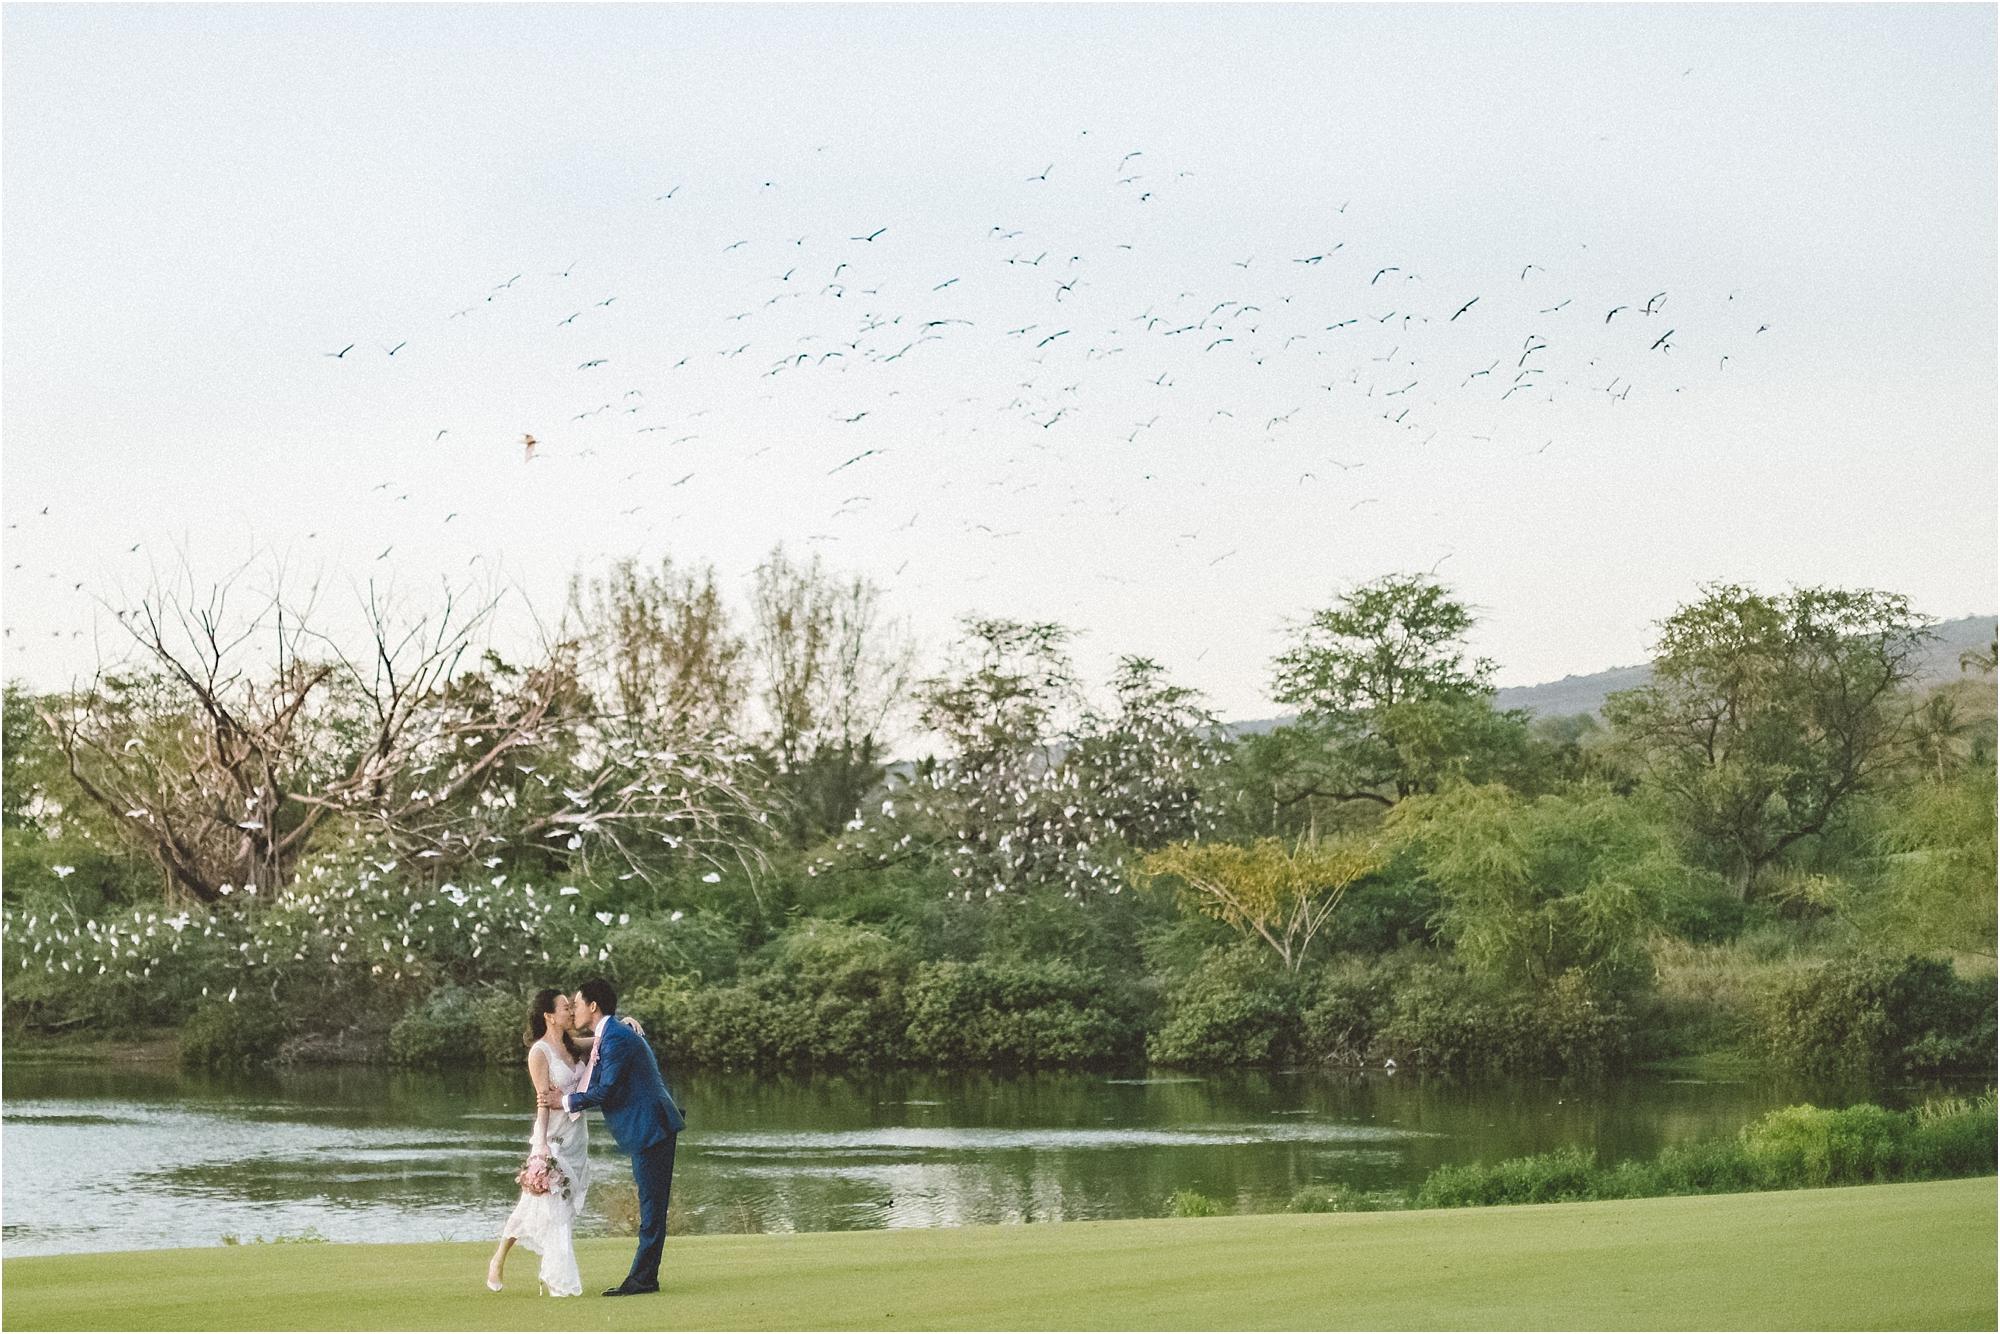 angie-diaz-photography-maui-hawaii-destination-wedding-makena-golf-beach-club_0067.jpg